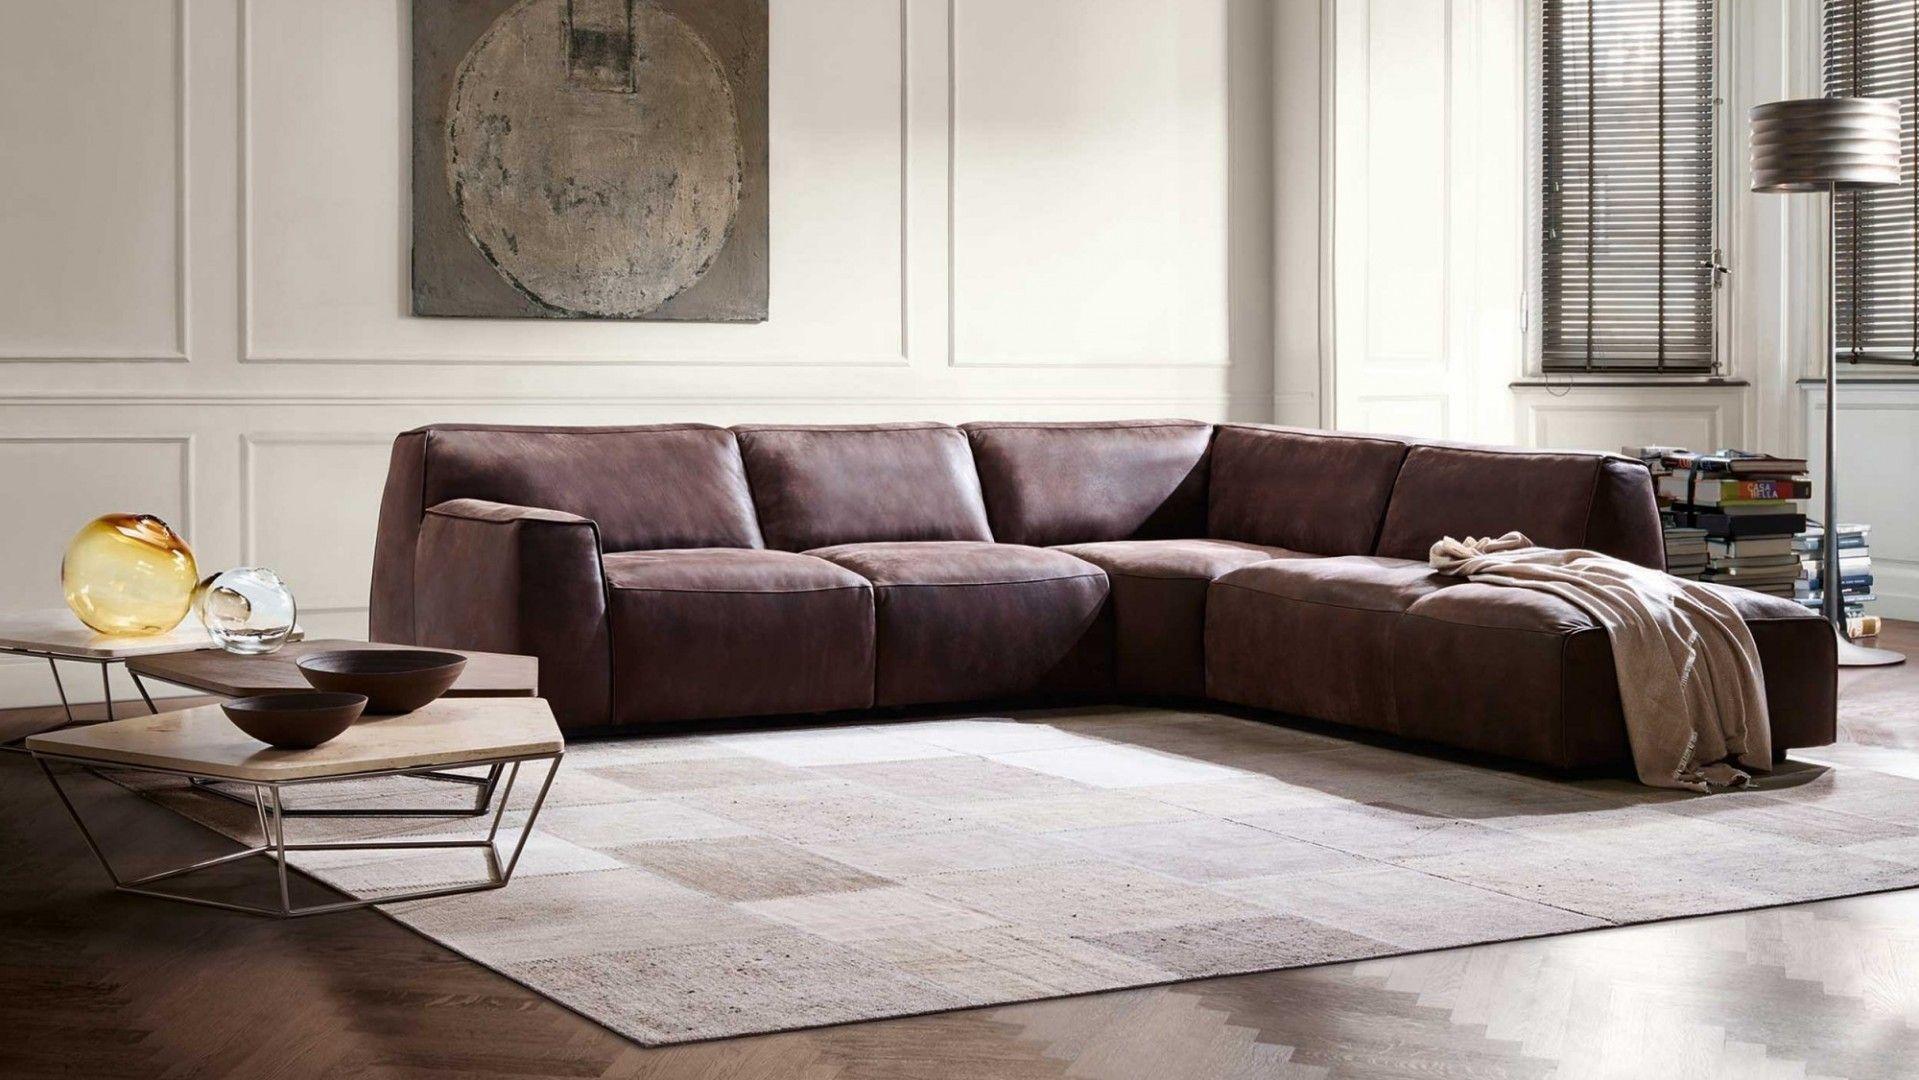 natuzzi italia b d inspirations pinterest sofa sofa design rh pinterest com